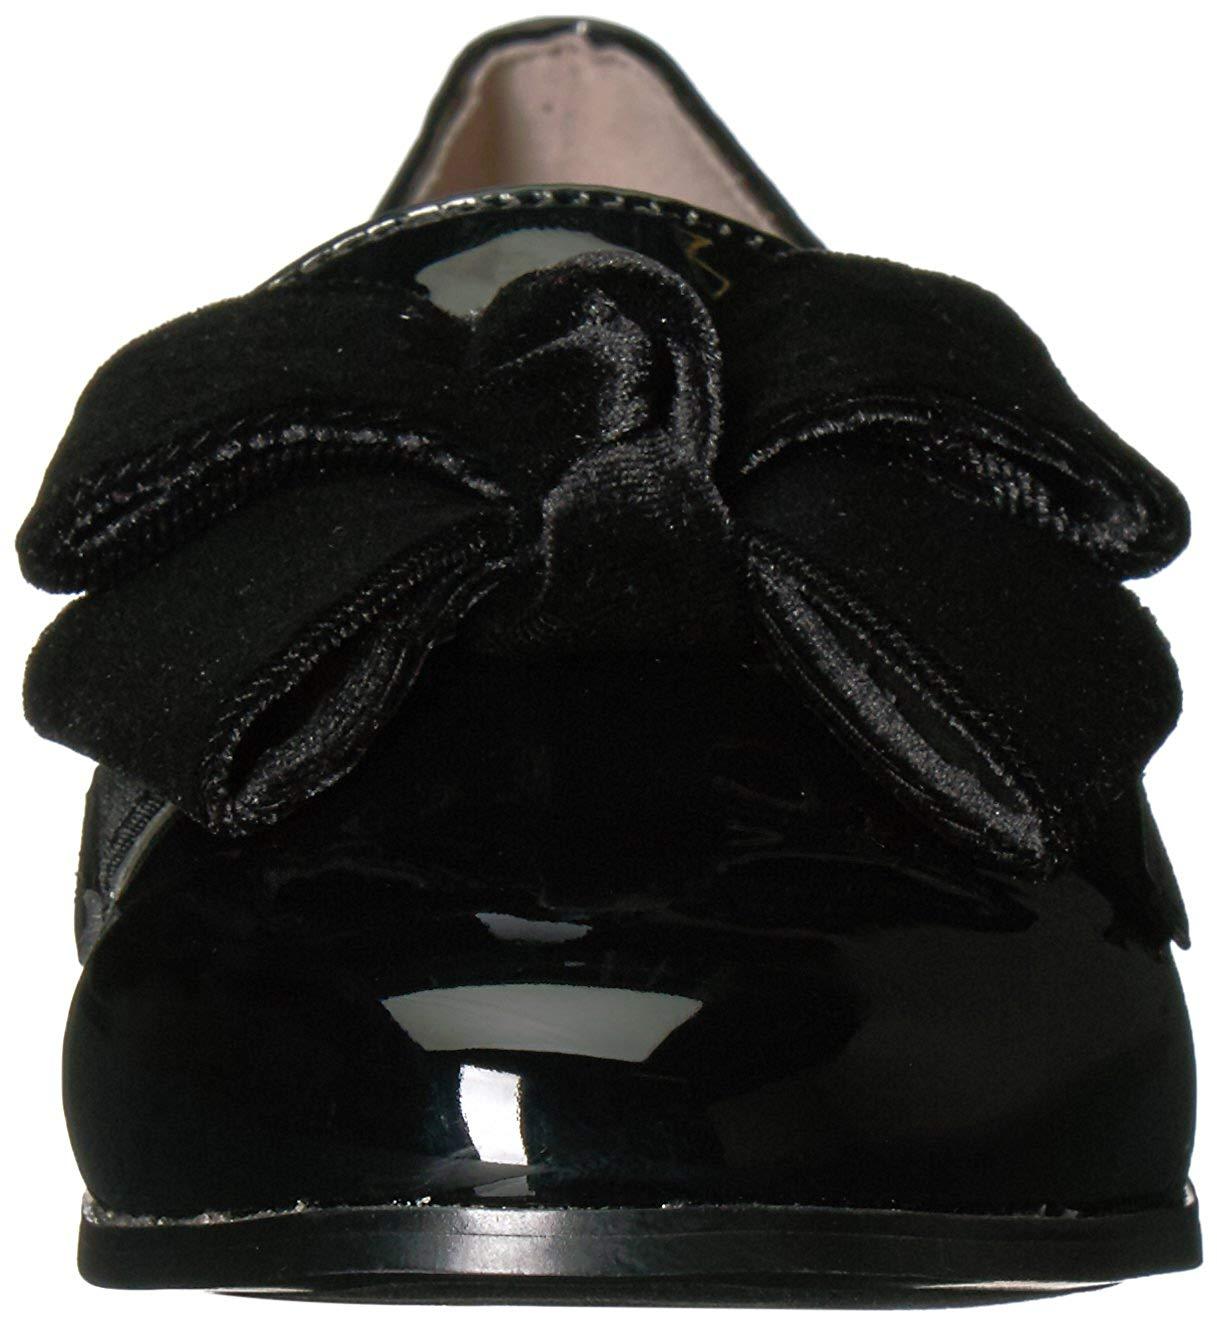 35927b92352 Bandolino Women s Lomb Loafer Flat